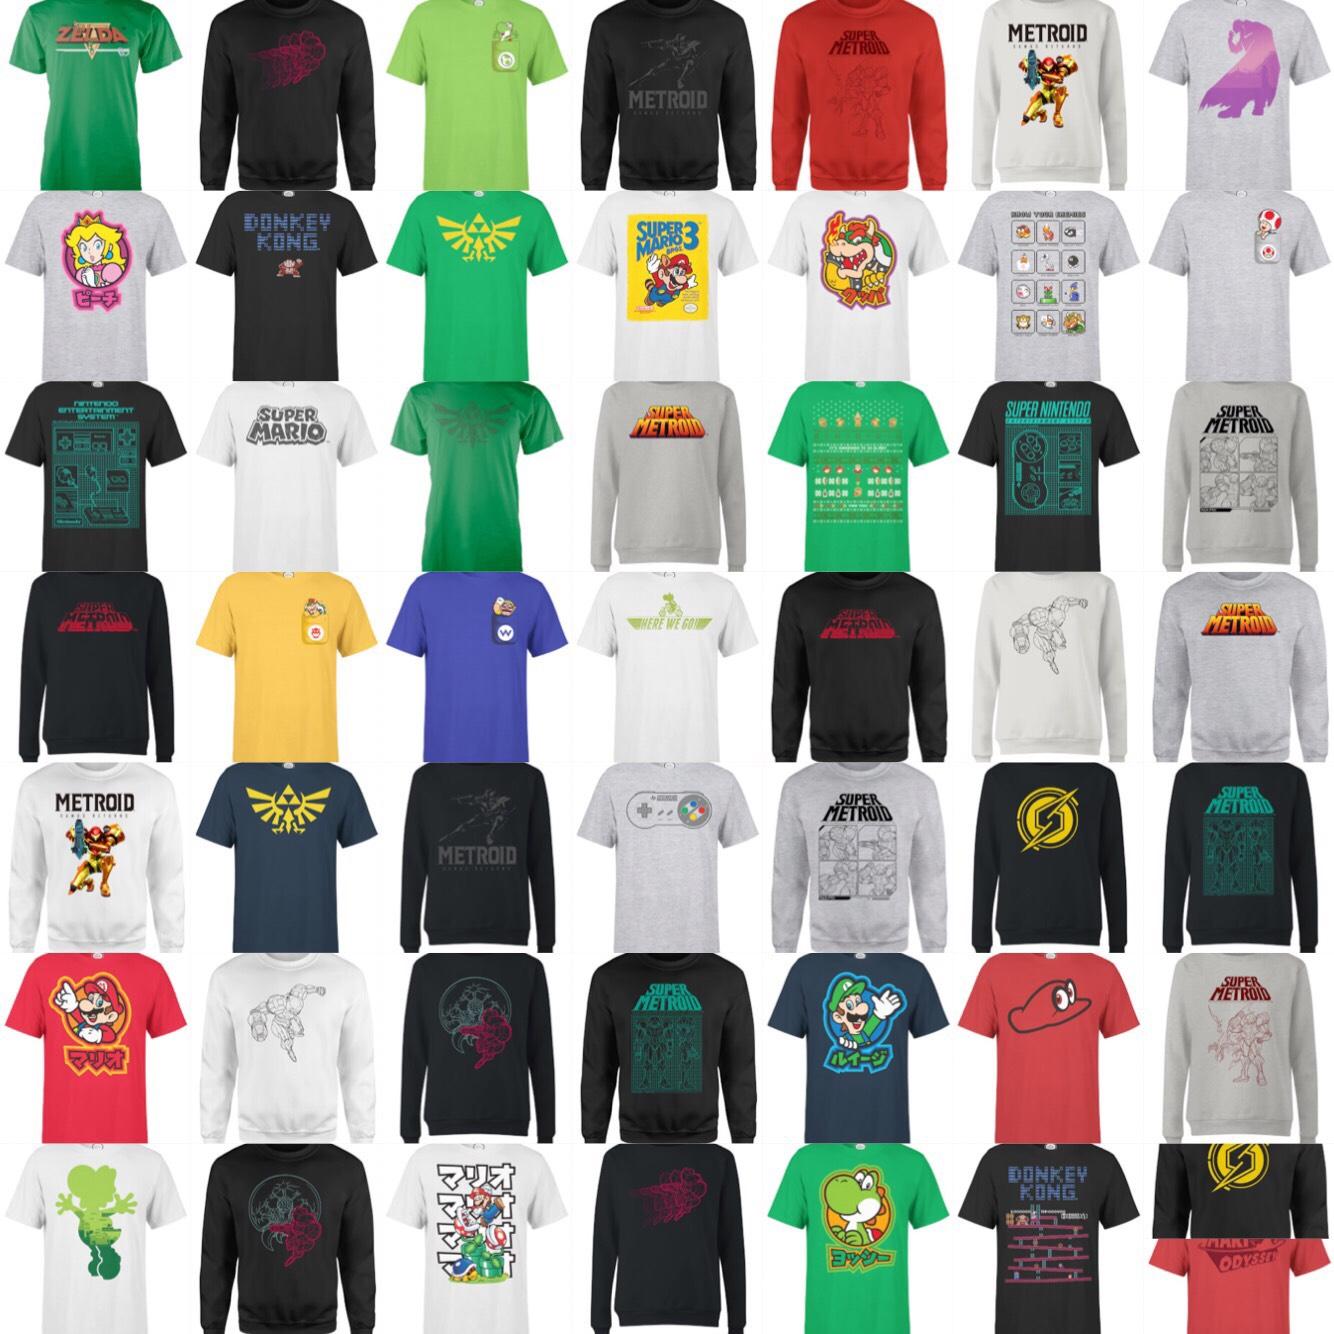 Nintendo Sweatshirt + t-shirt £24.99 (+99p delivery) @ Zavvi